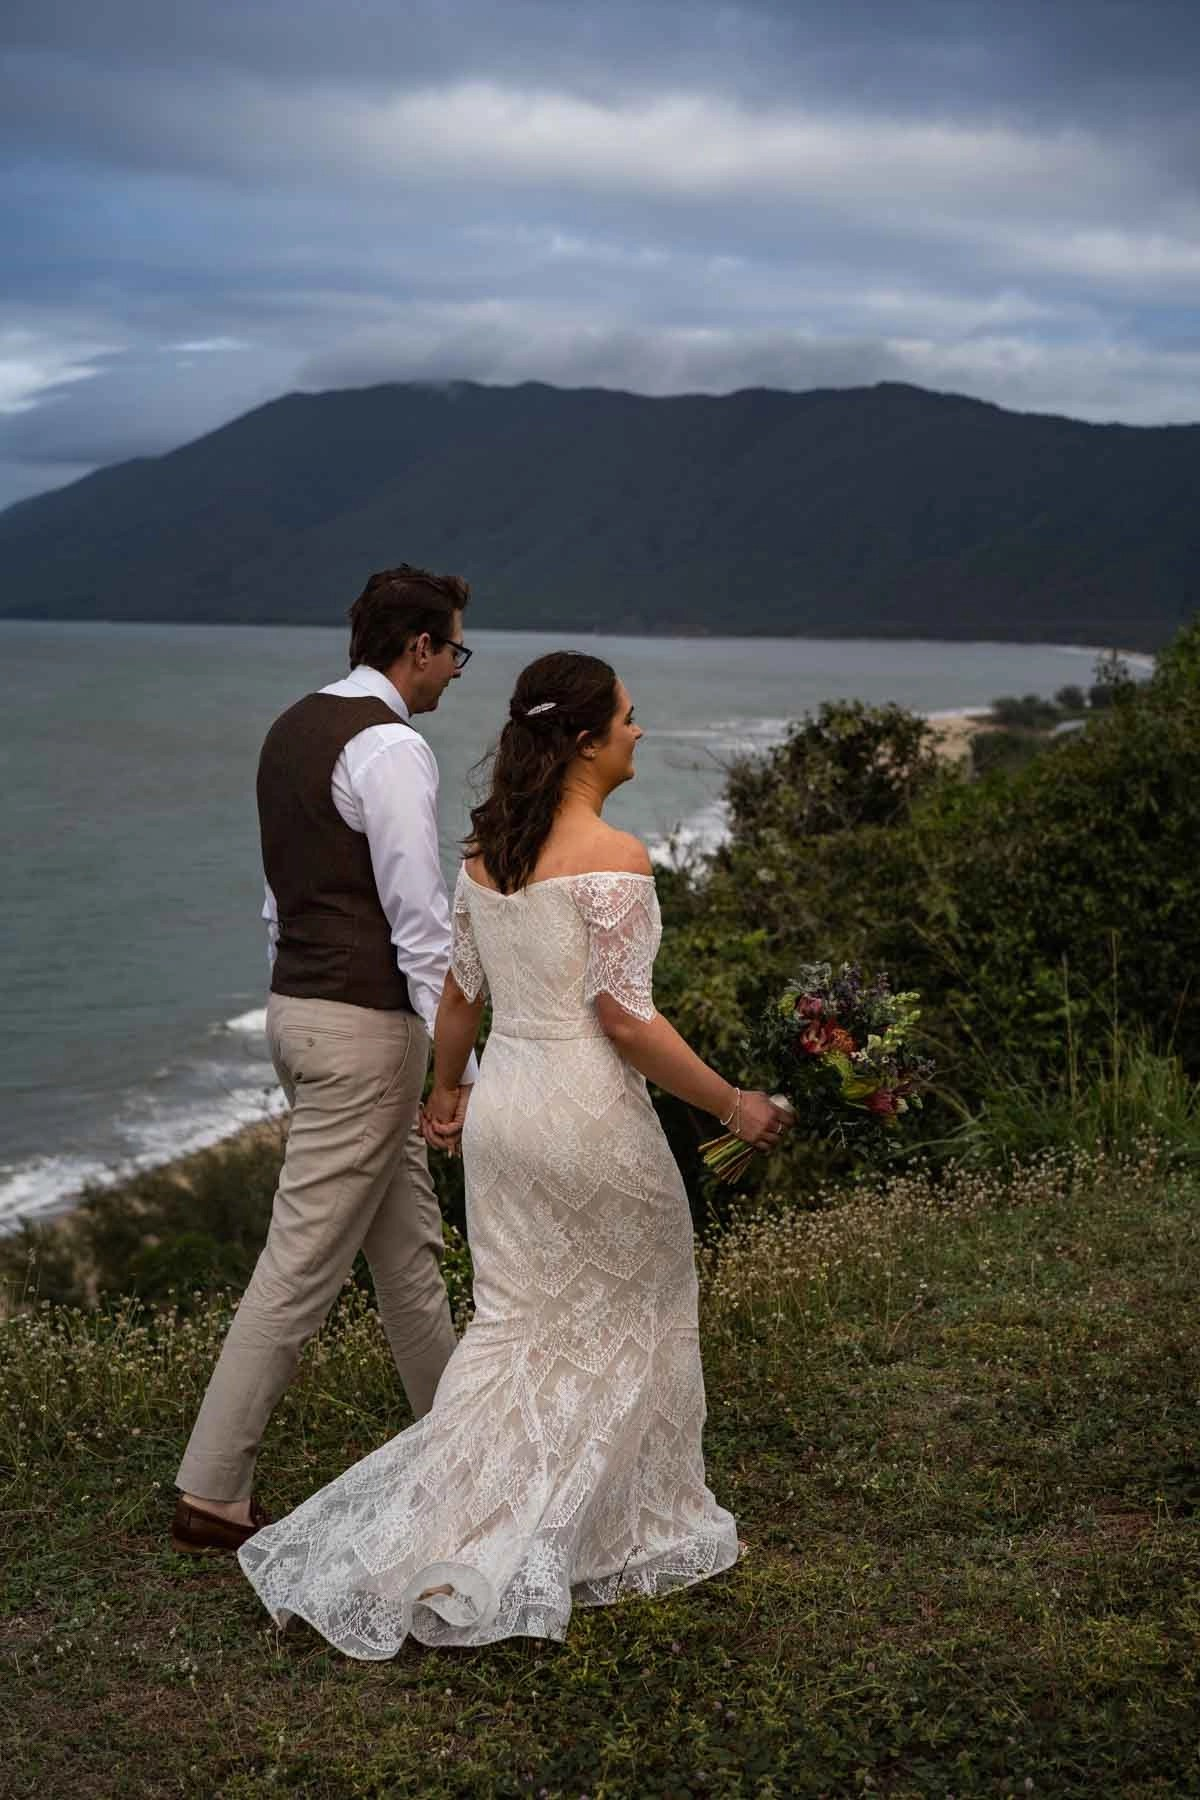 Landscape environmental portrait bride and groom